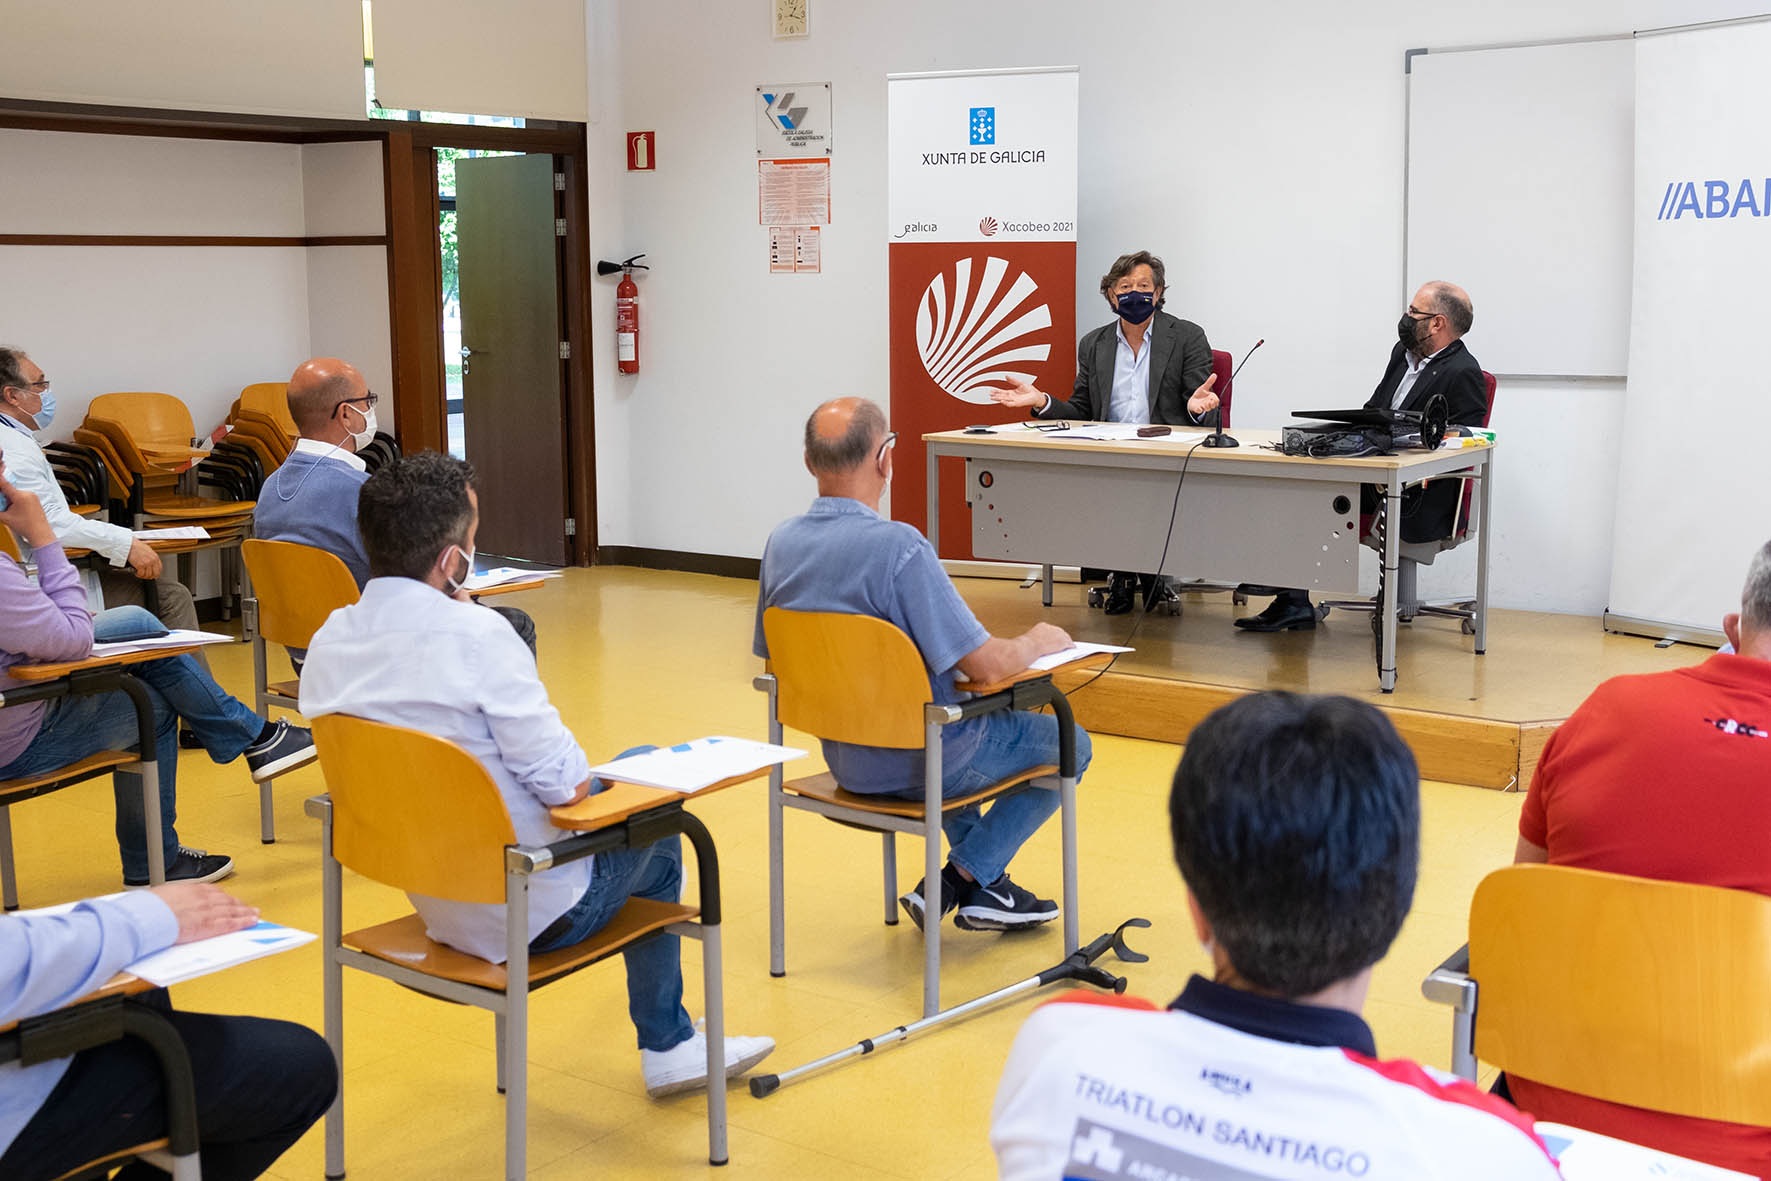 Plan de Patrocinio Publicitario dos Equipos de Alta Competición de Galicia da Fundación Deporte Galego, equipos de Santiago / XUNTA DE GALICIA